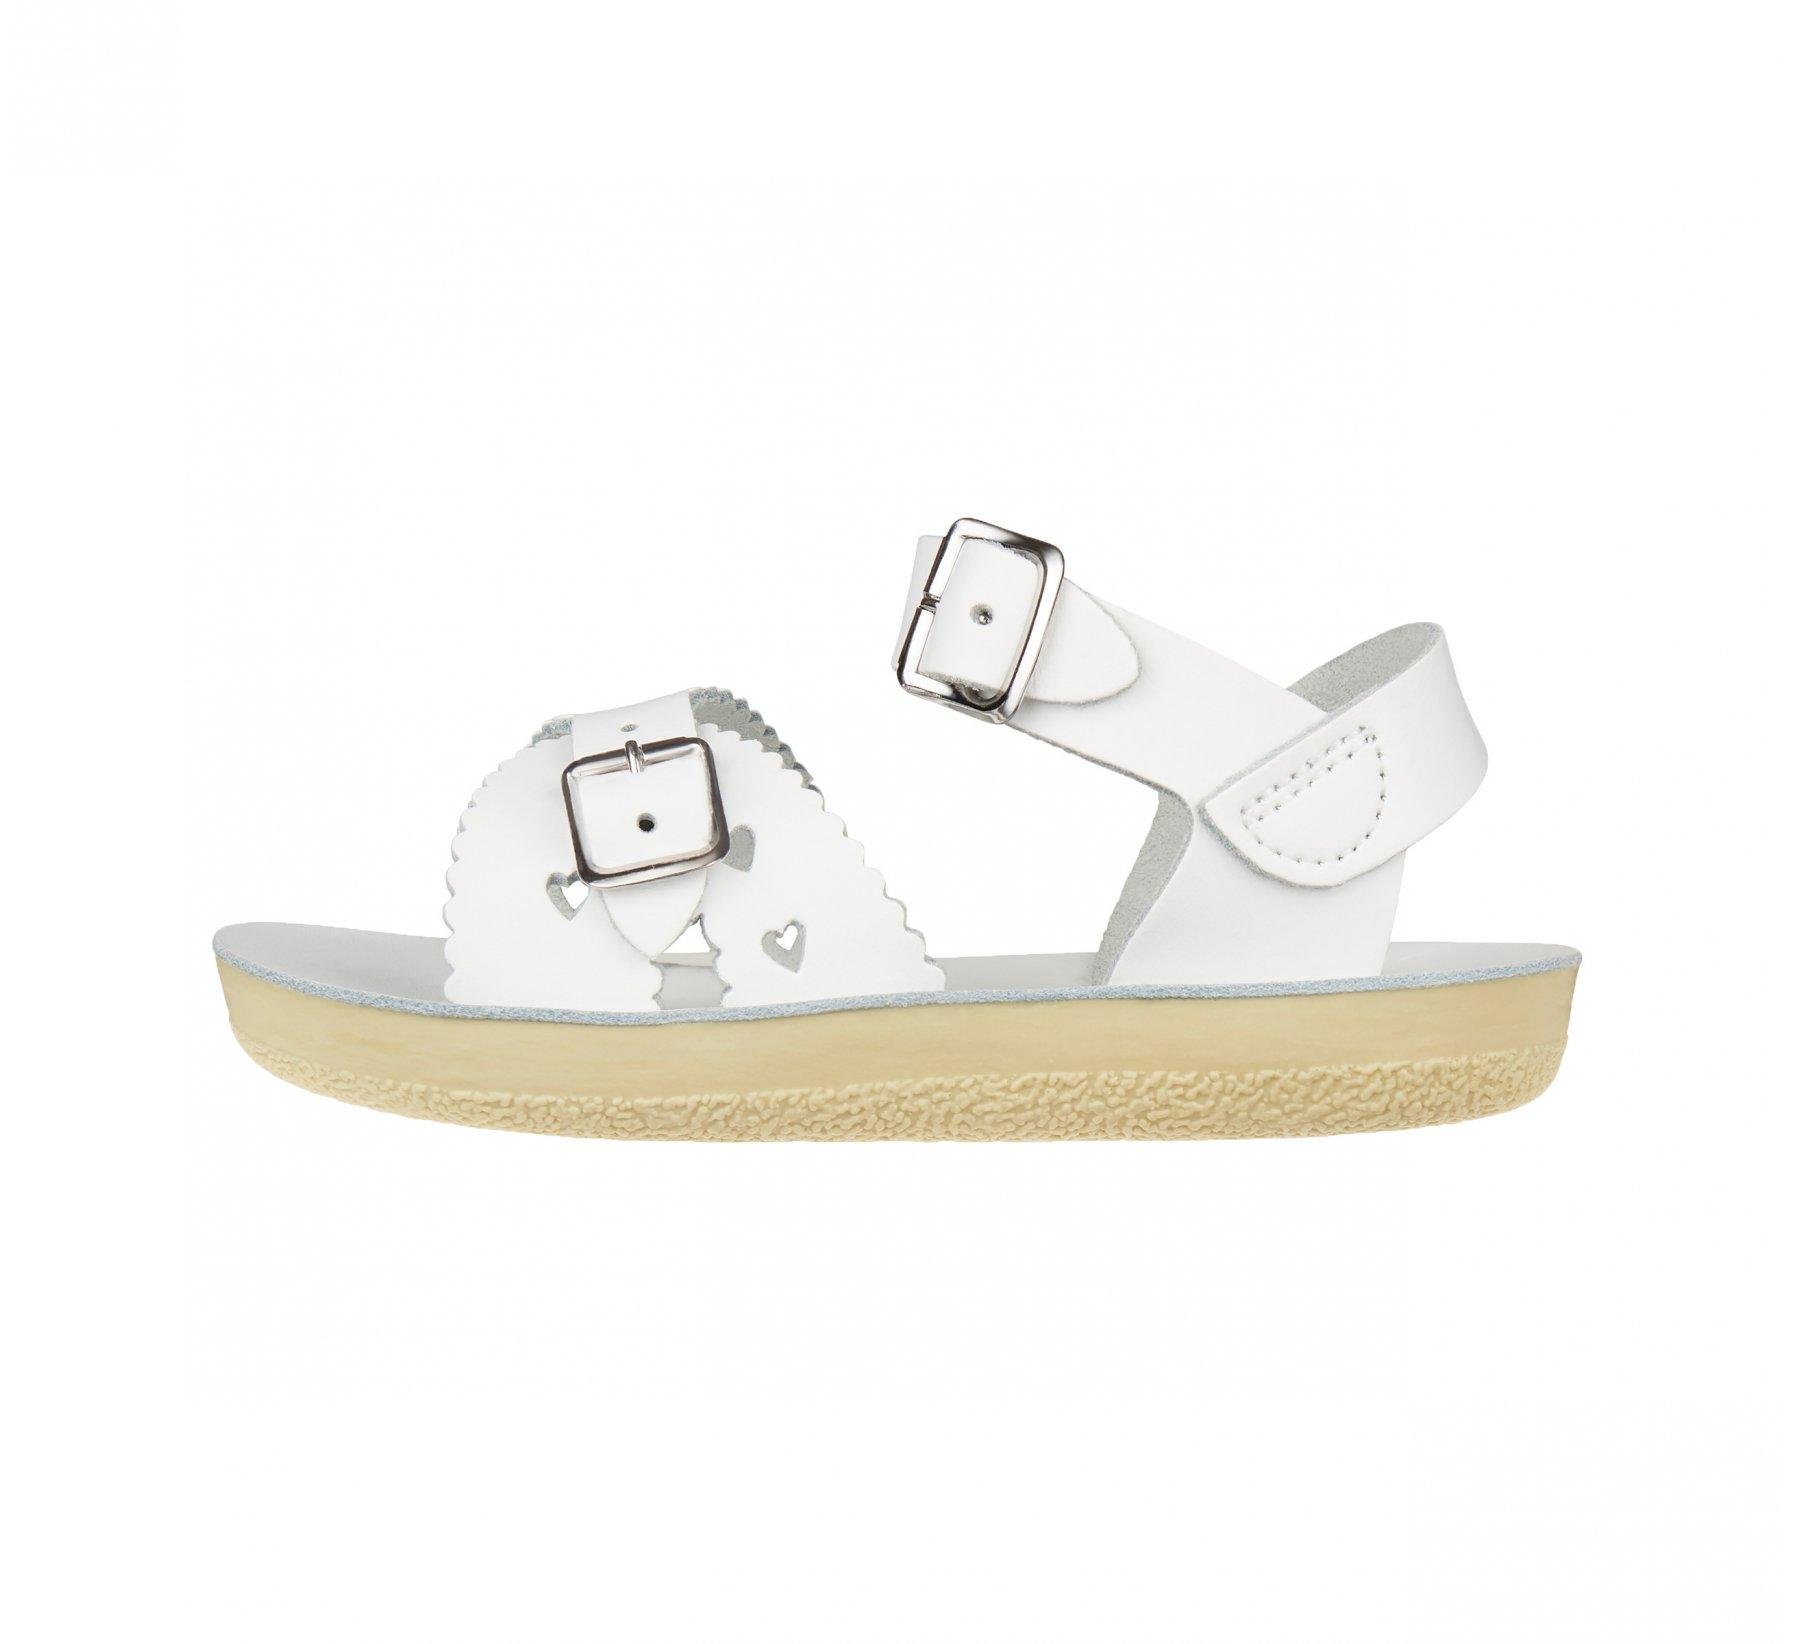 Sweetheart Putih - Salt Water Sandals